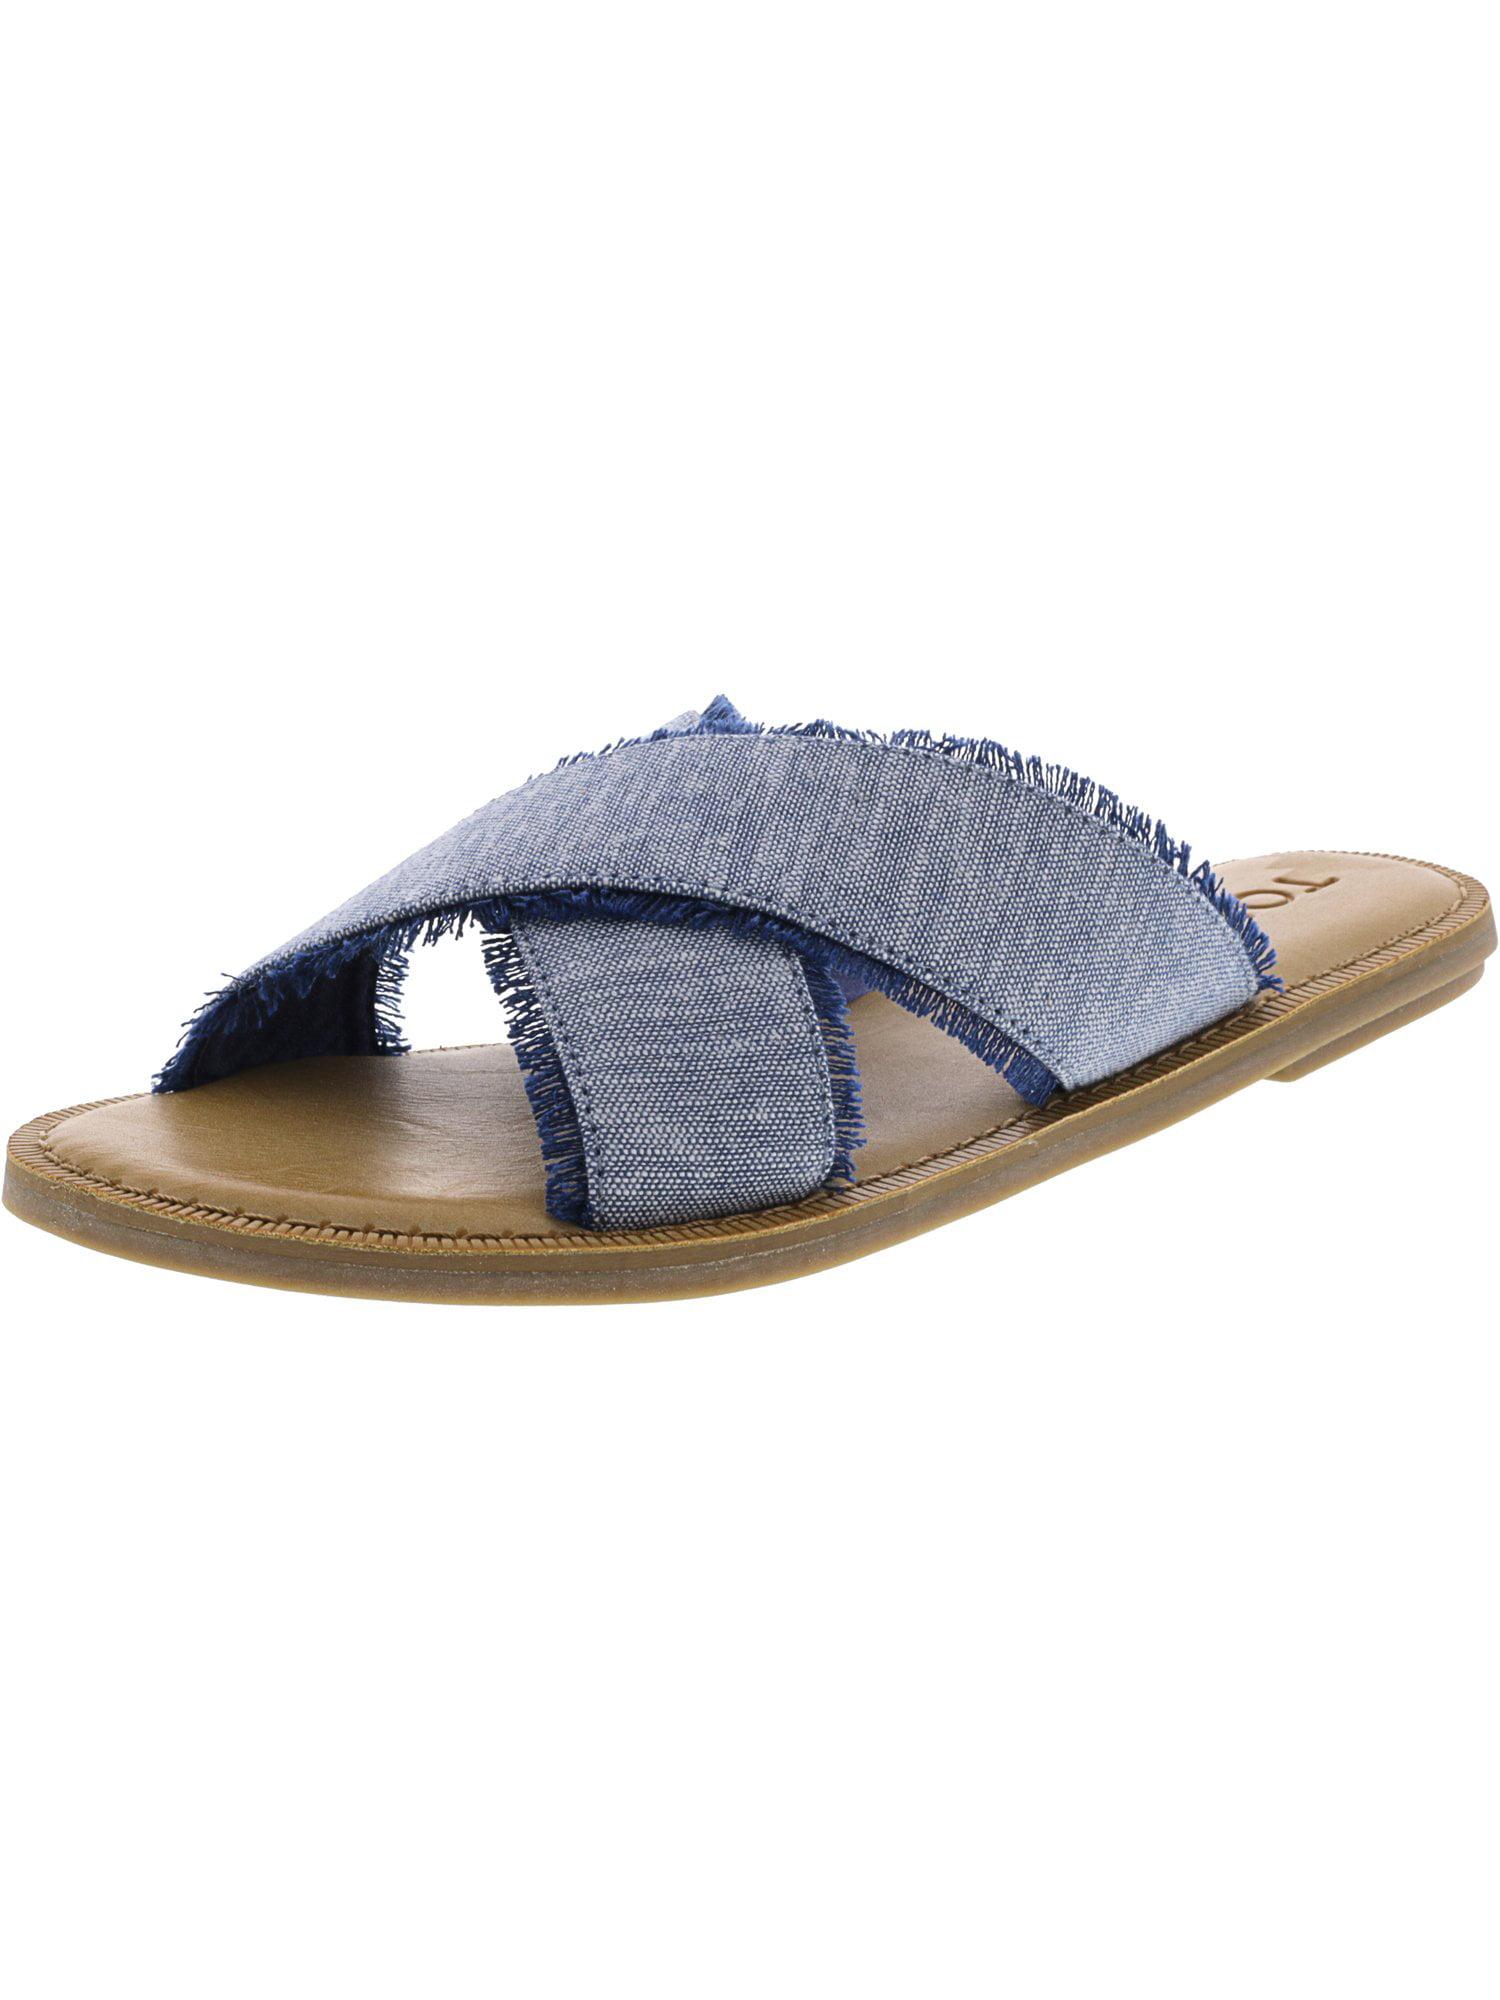 Toms Women's Viv Slub Chambray Blue Fabric Sandal - 7M